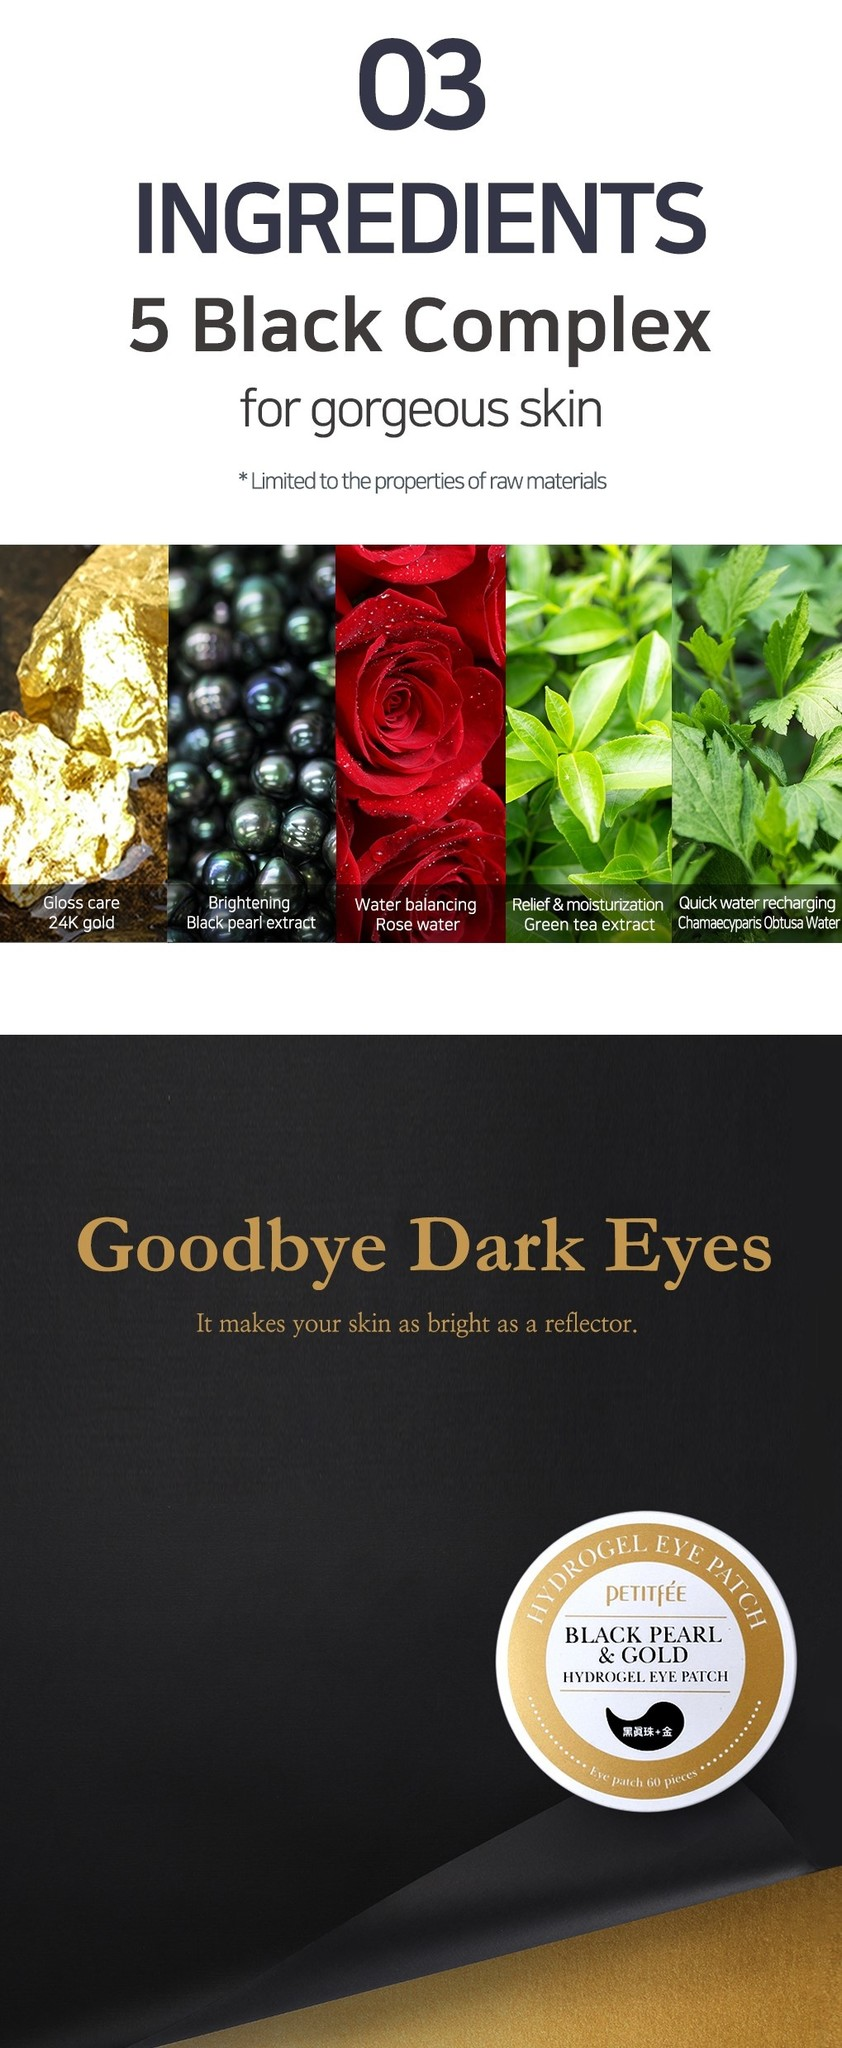 Black Pearl & Gold Eye Patch-6